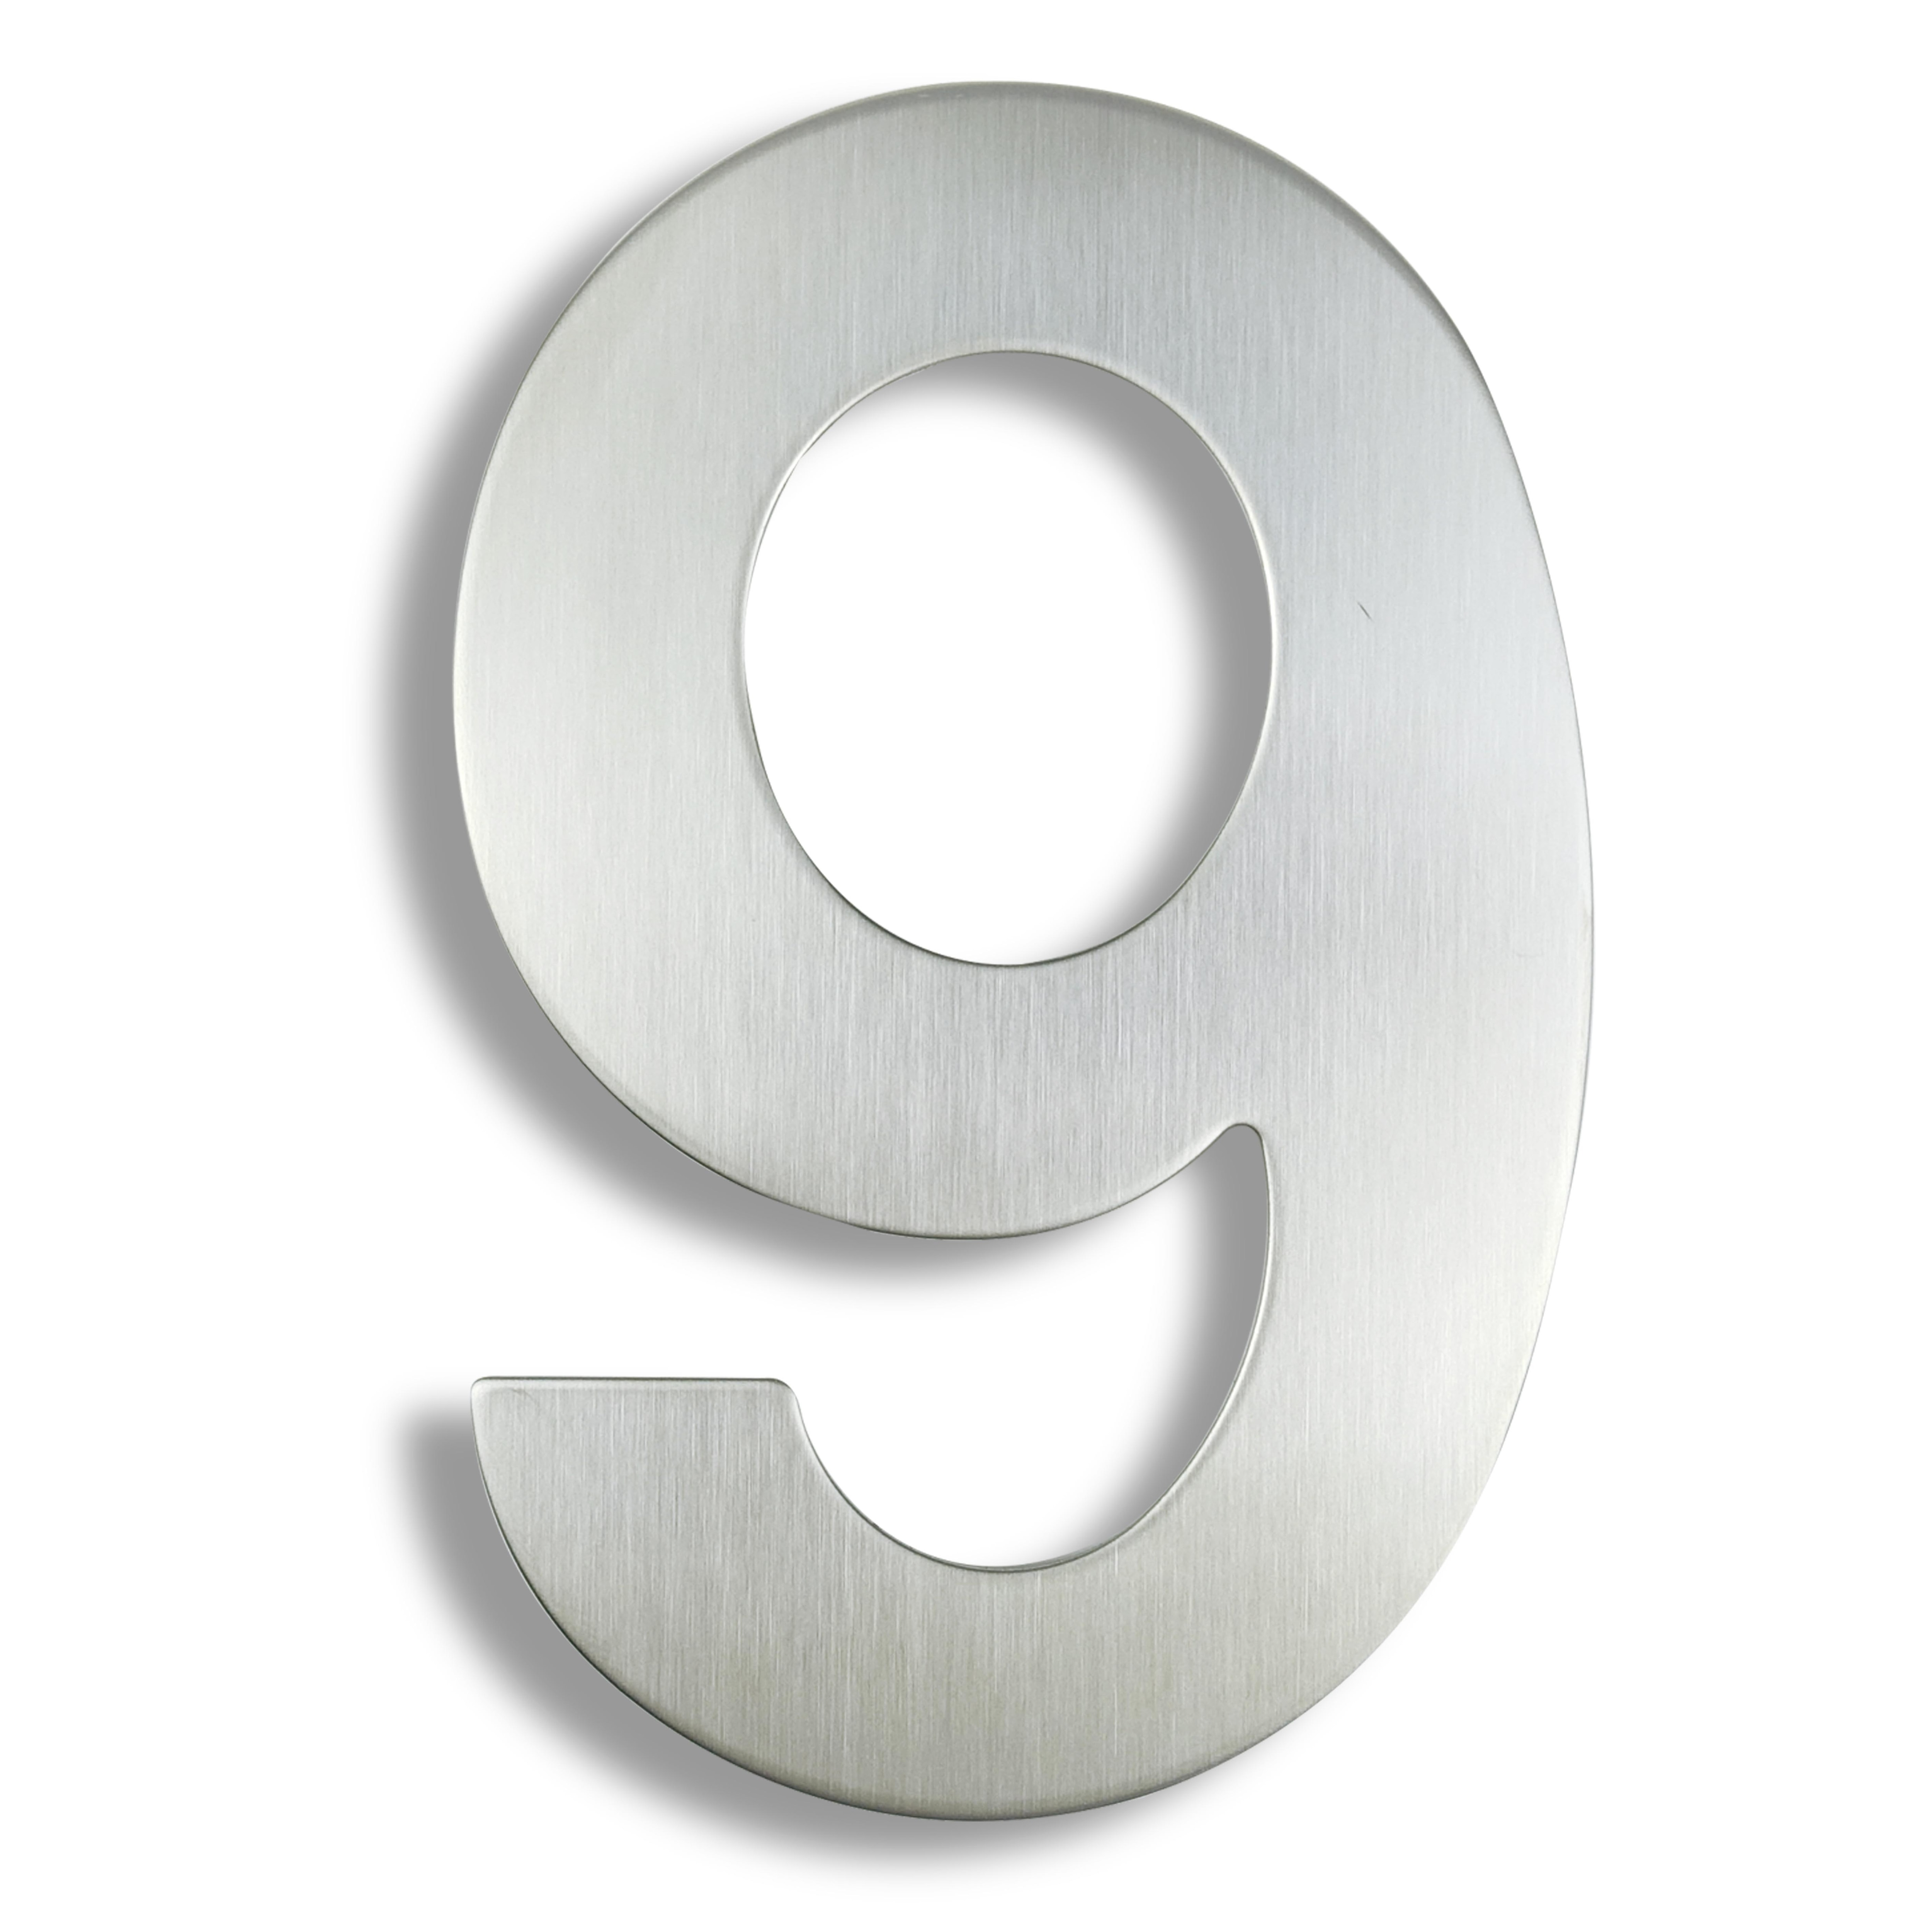 Número de la Casa de 15cm, señal #9 Huisnummer para exteriores, plata,...